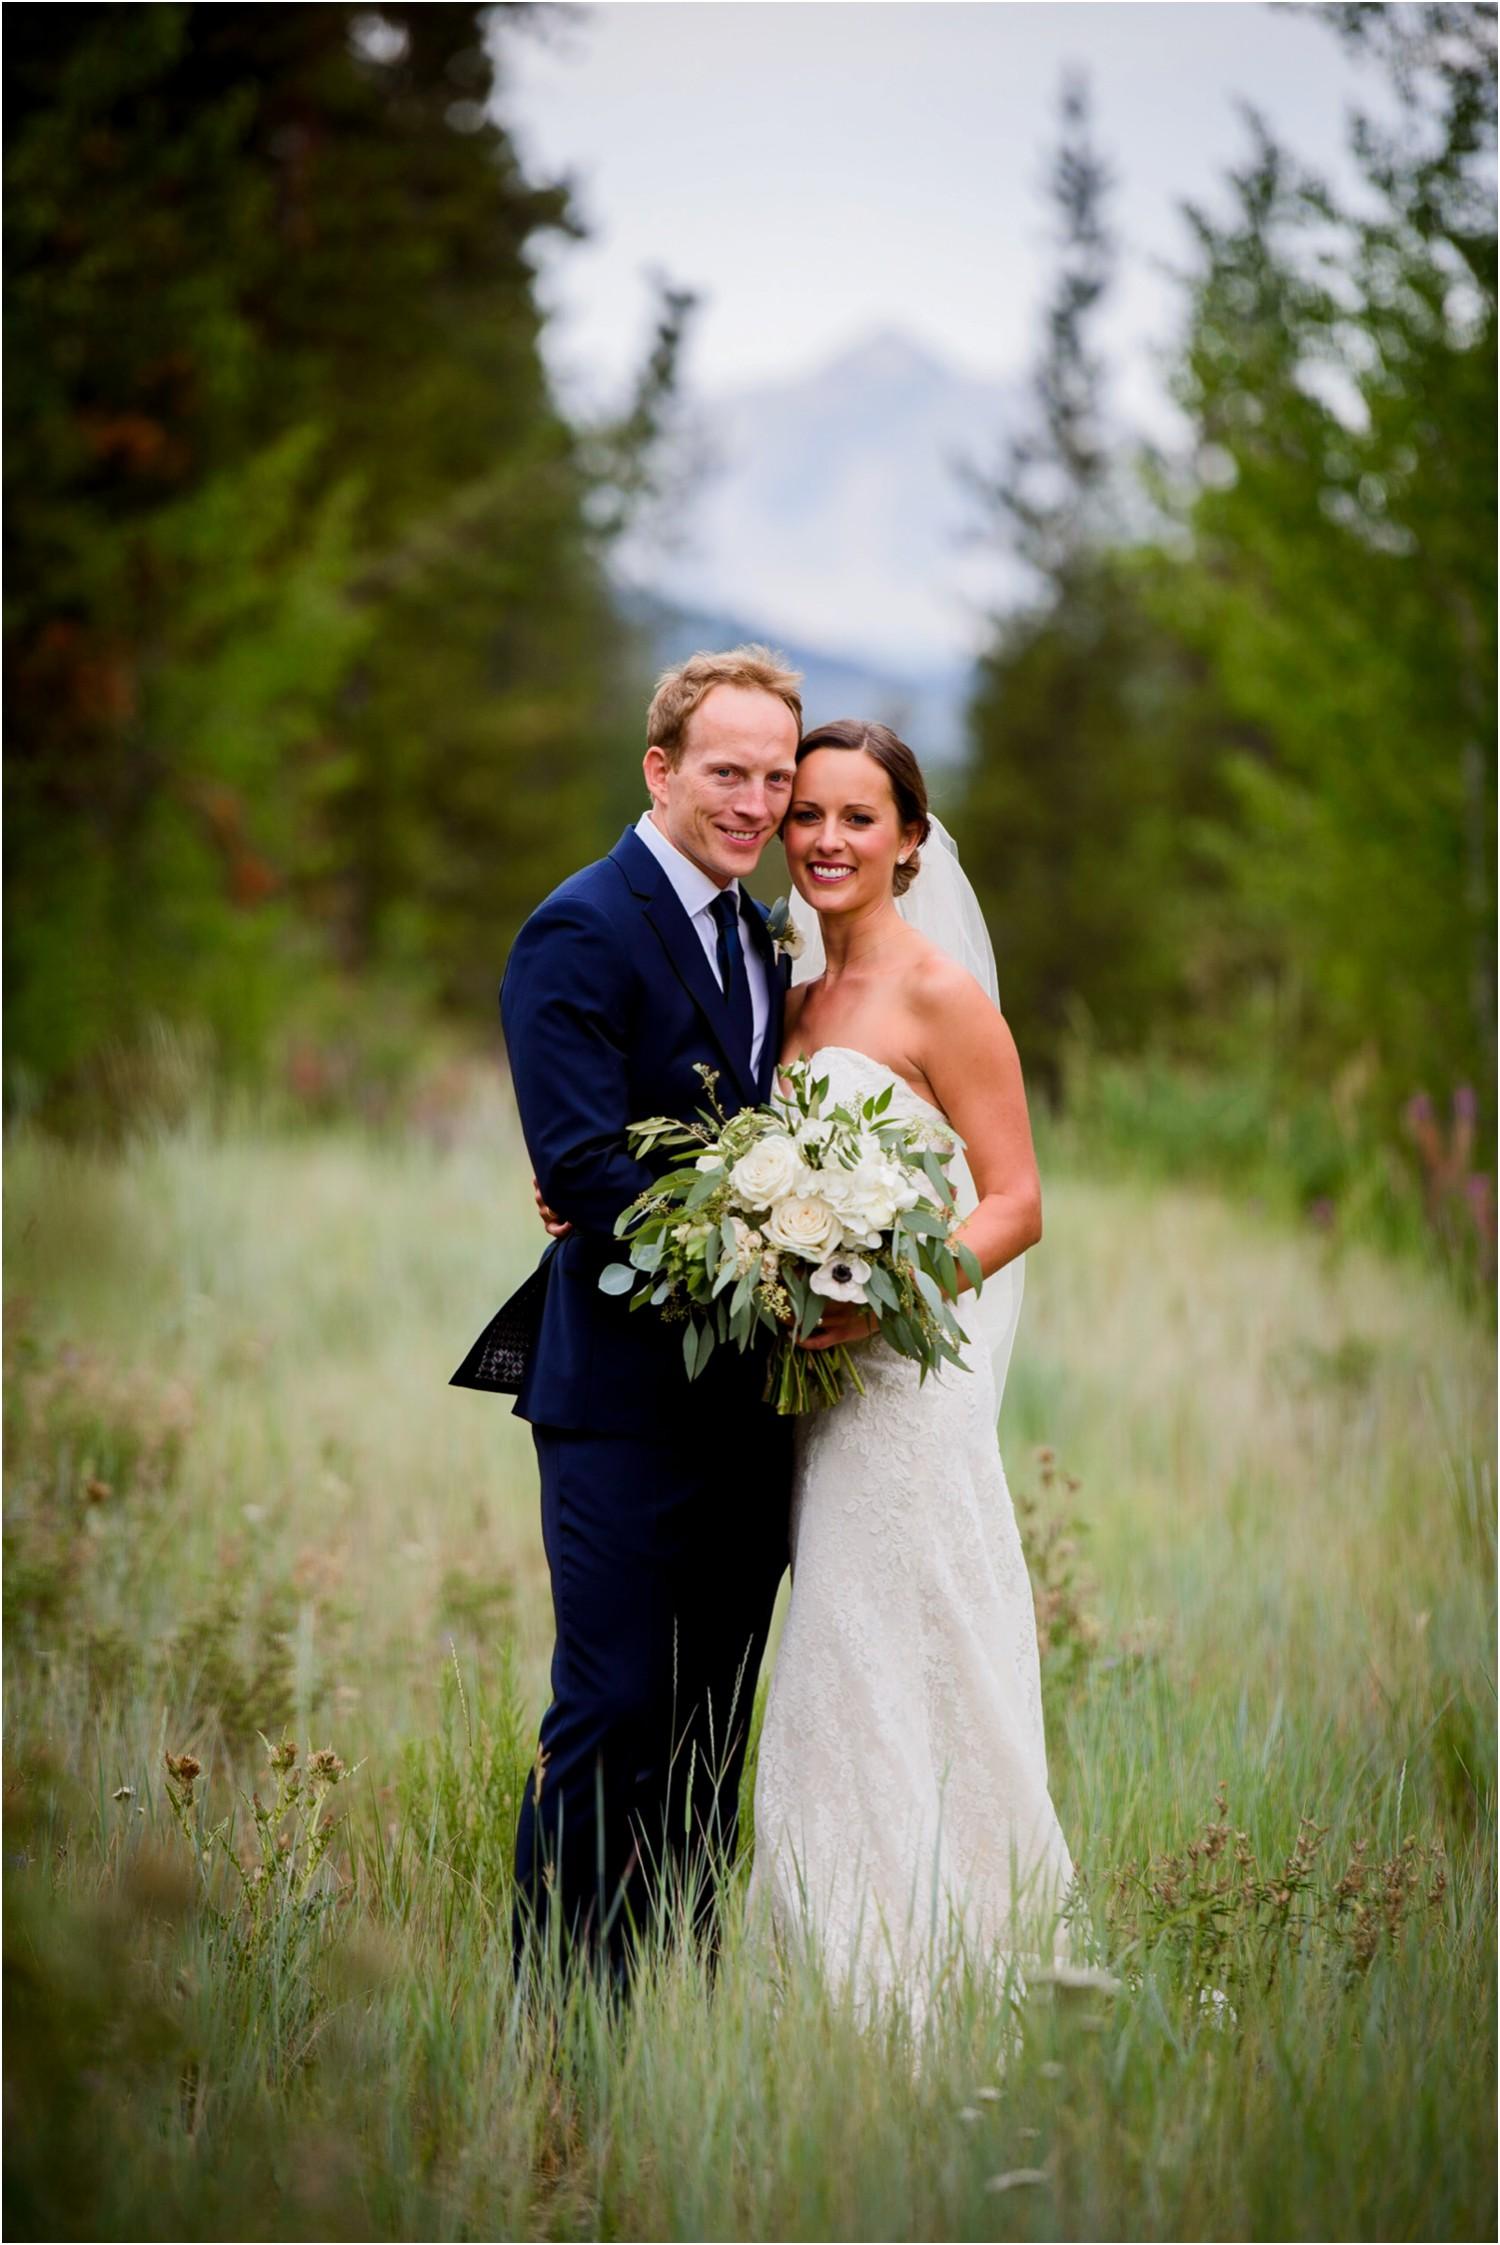 Arapahoe-basin-Colorado-summer-wedding_0150.jpg